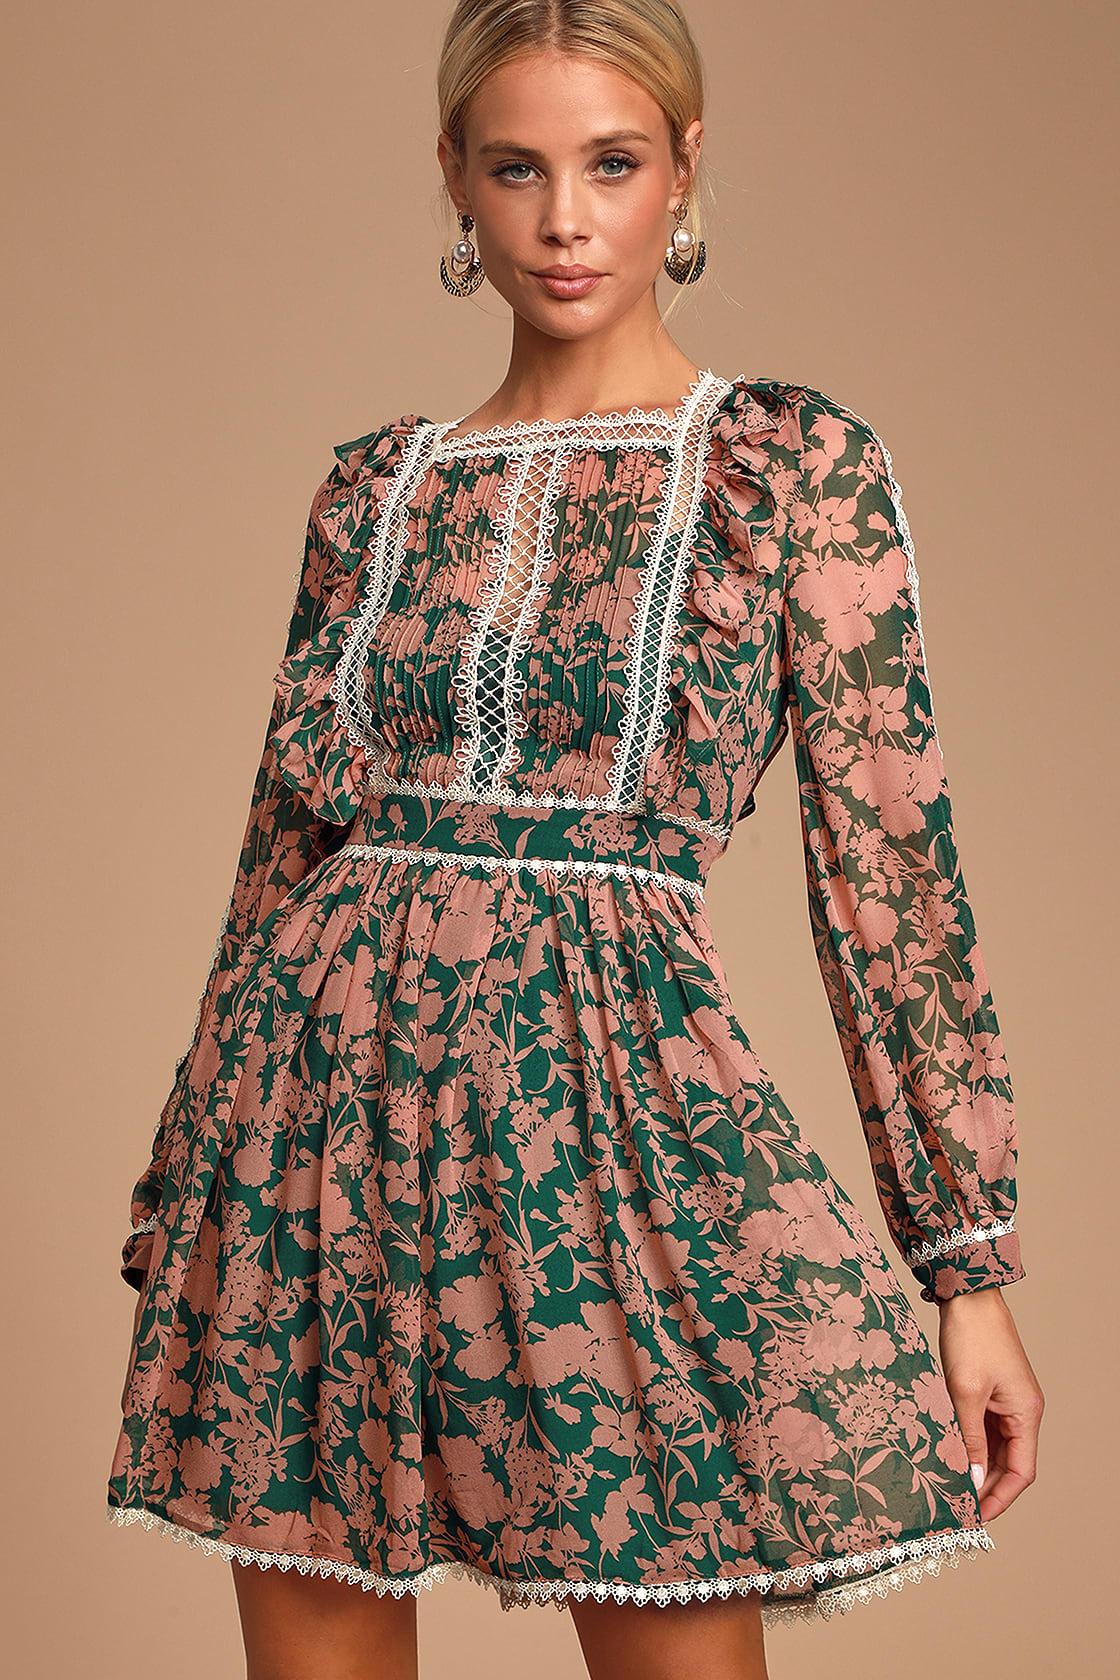 Tatlana Pink And Green Floral Print Long Sleeve Skater Dress by Jovonna London